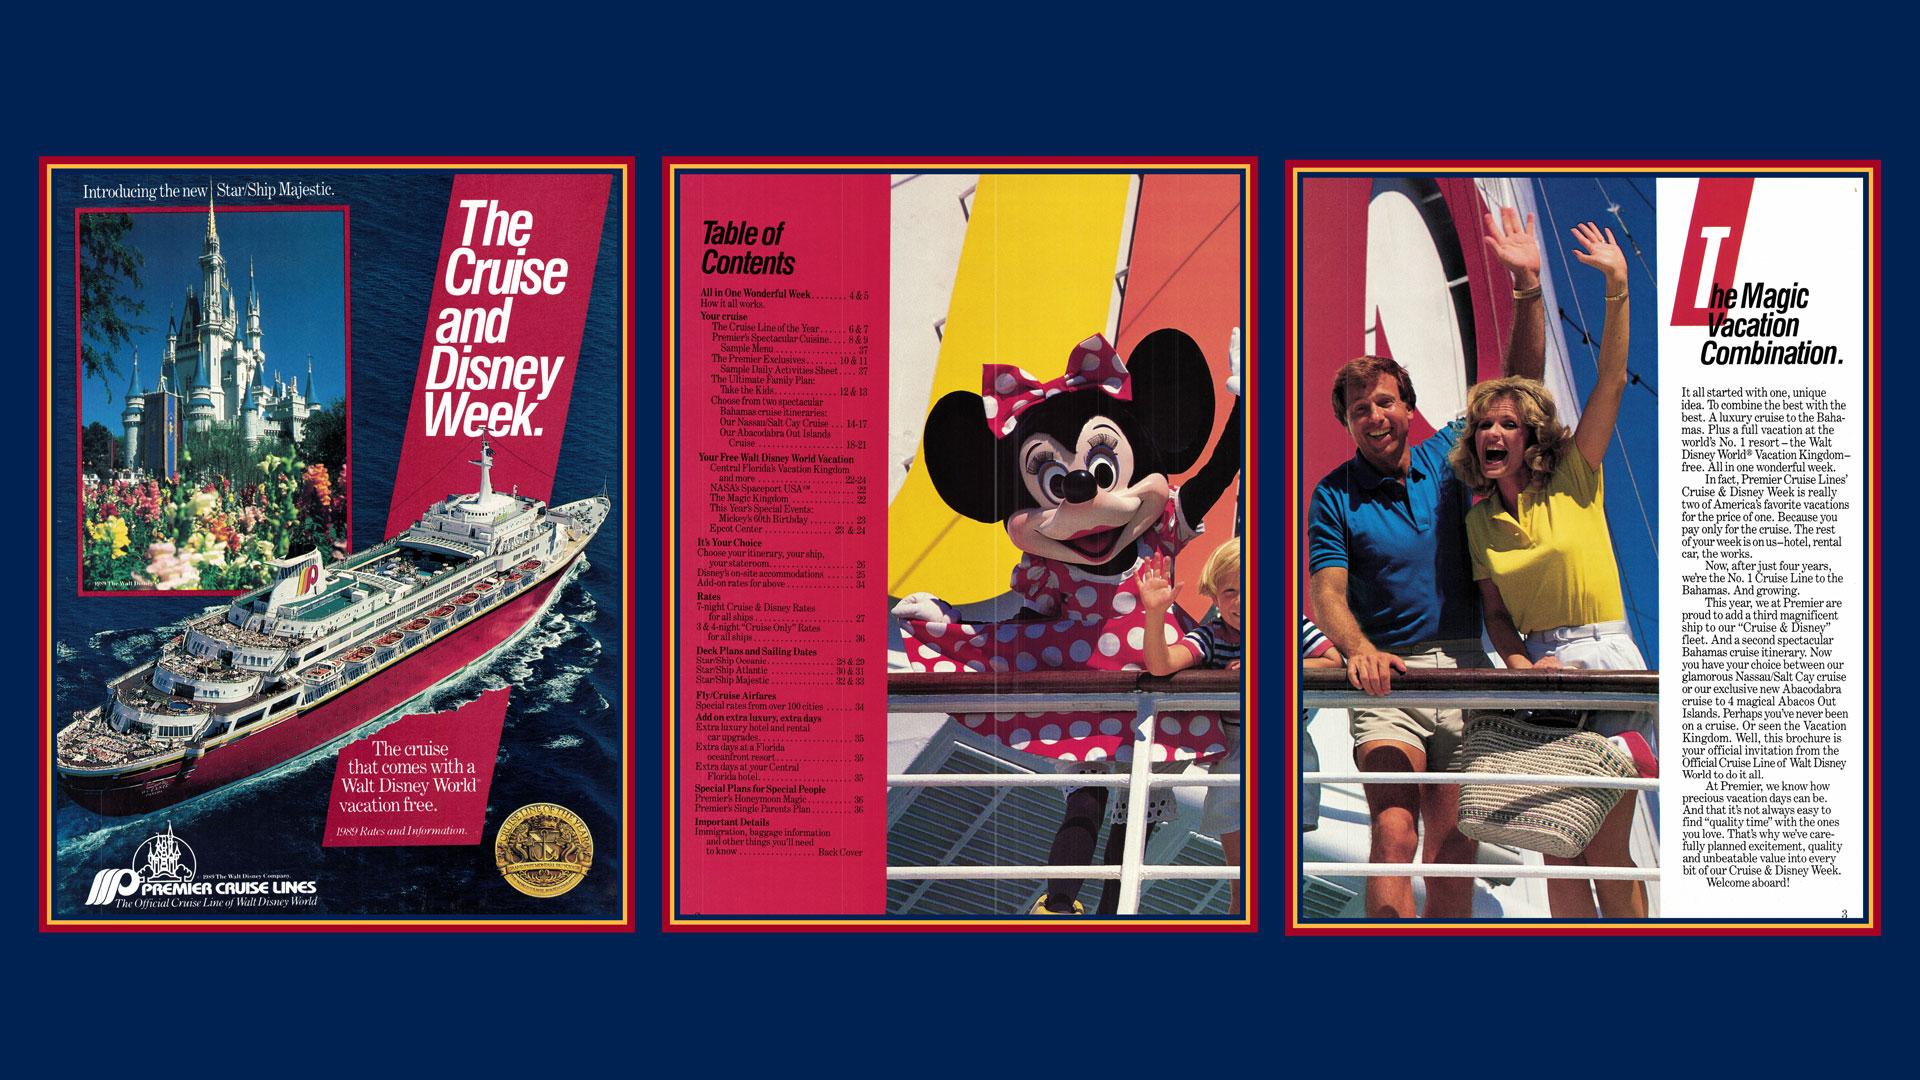 Premier Cruise Line Booklet 1989 Rates Information